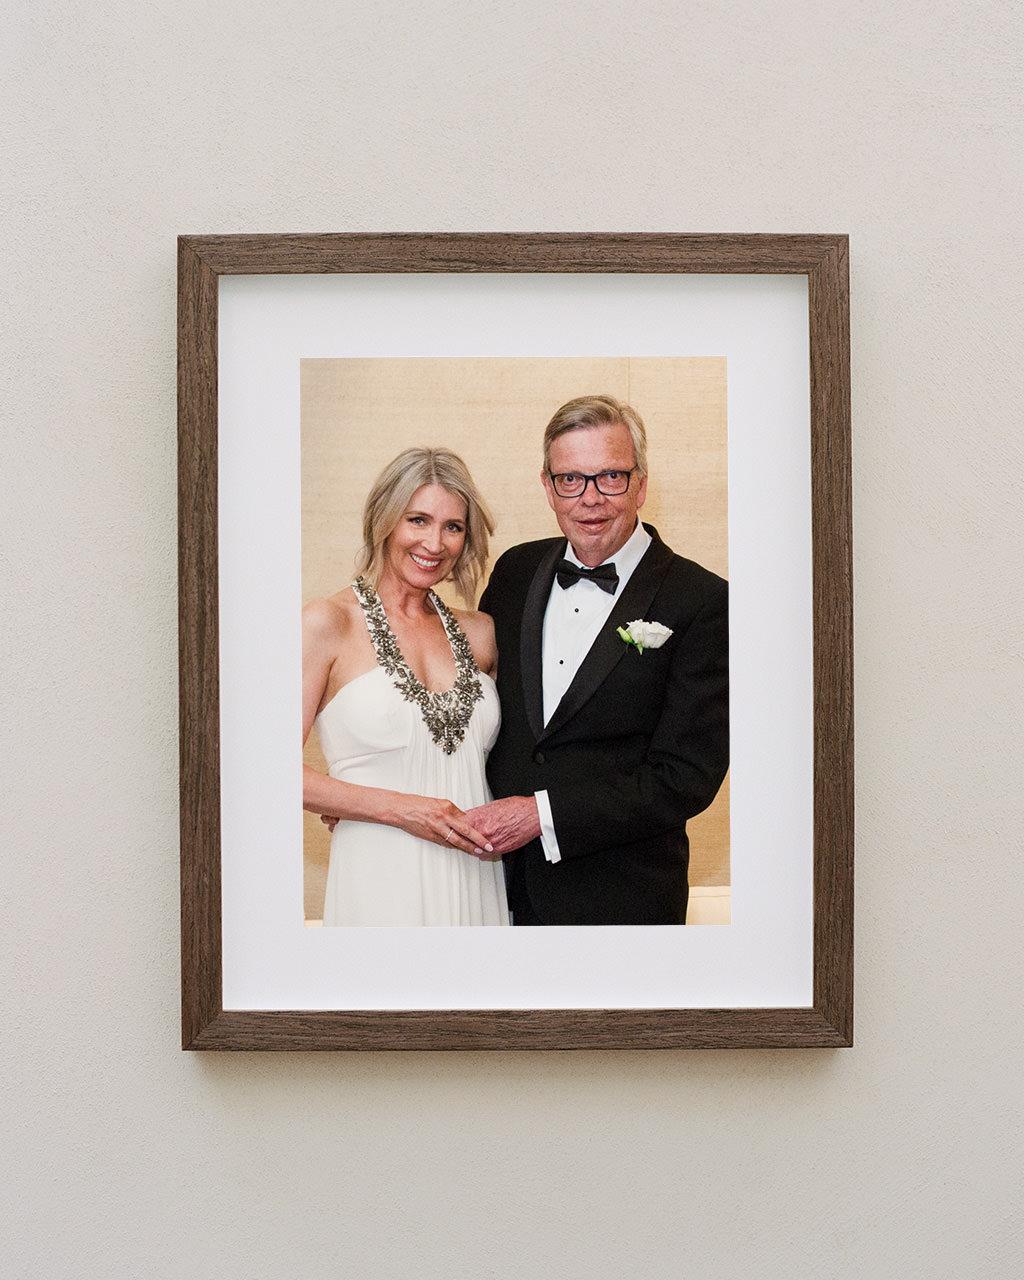 Framed portrait of newlyweds at their Est Restaurant wedding